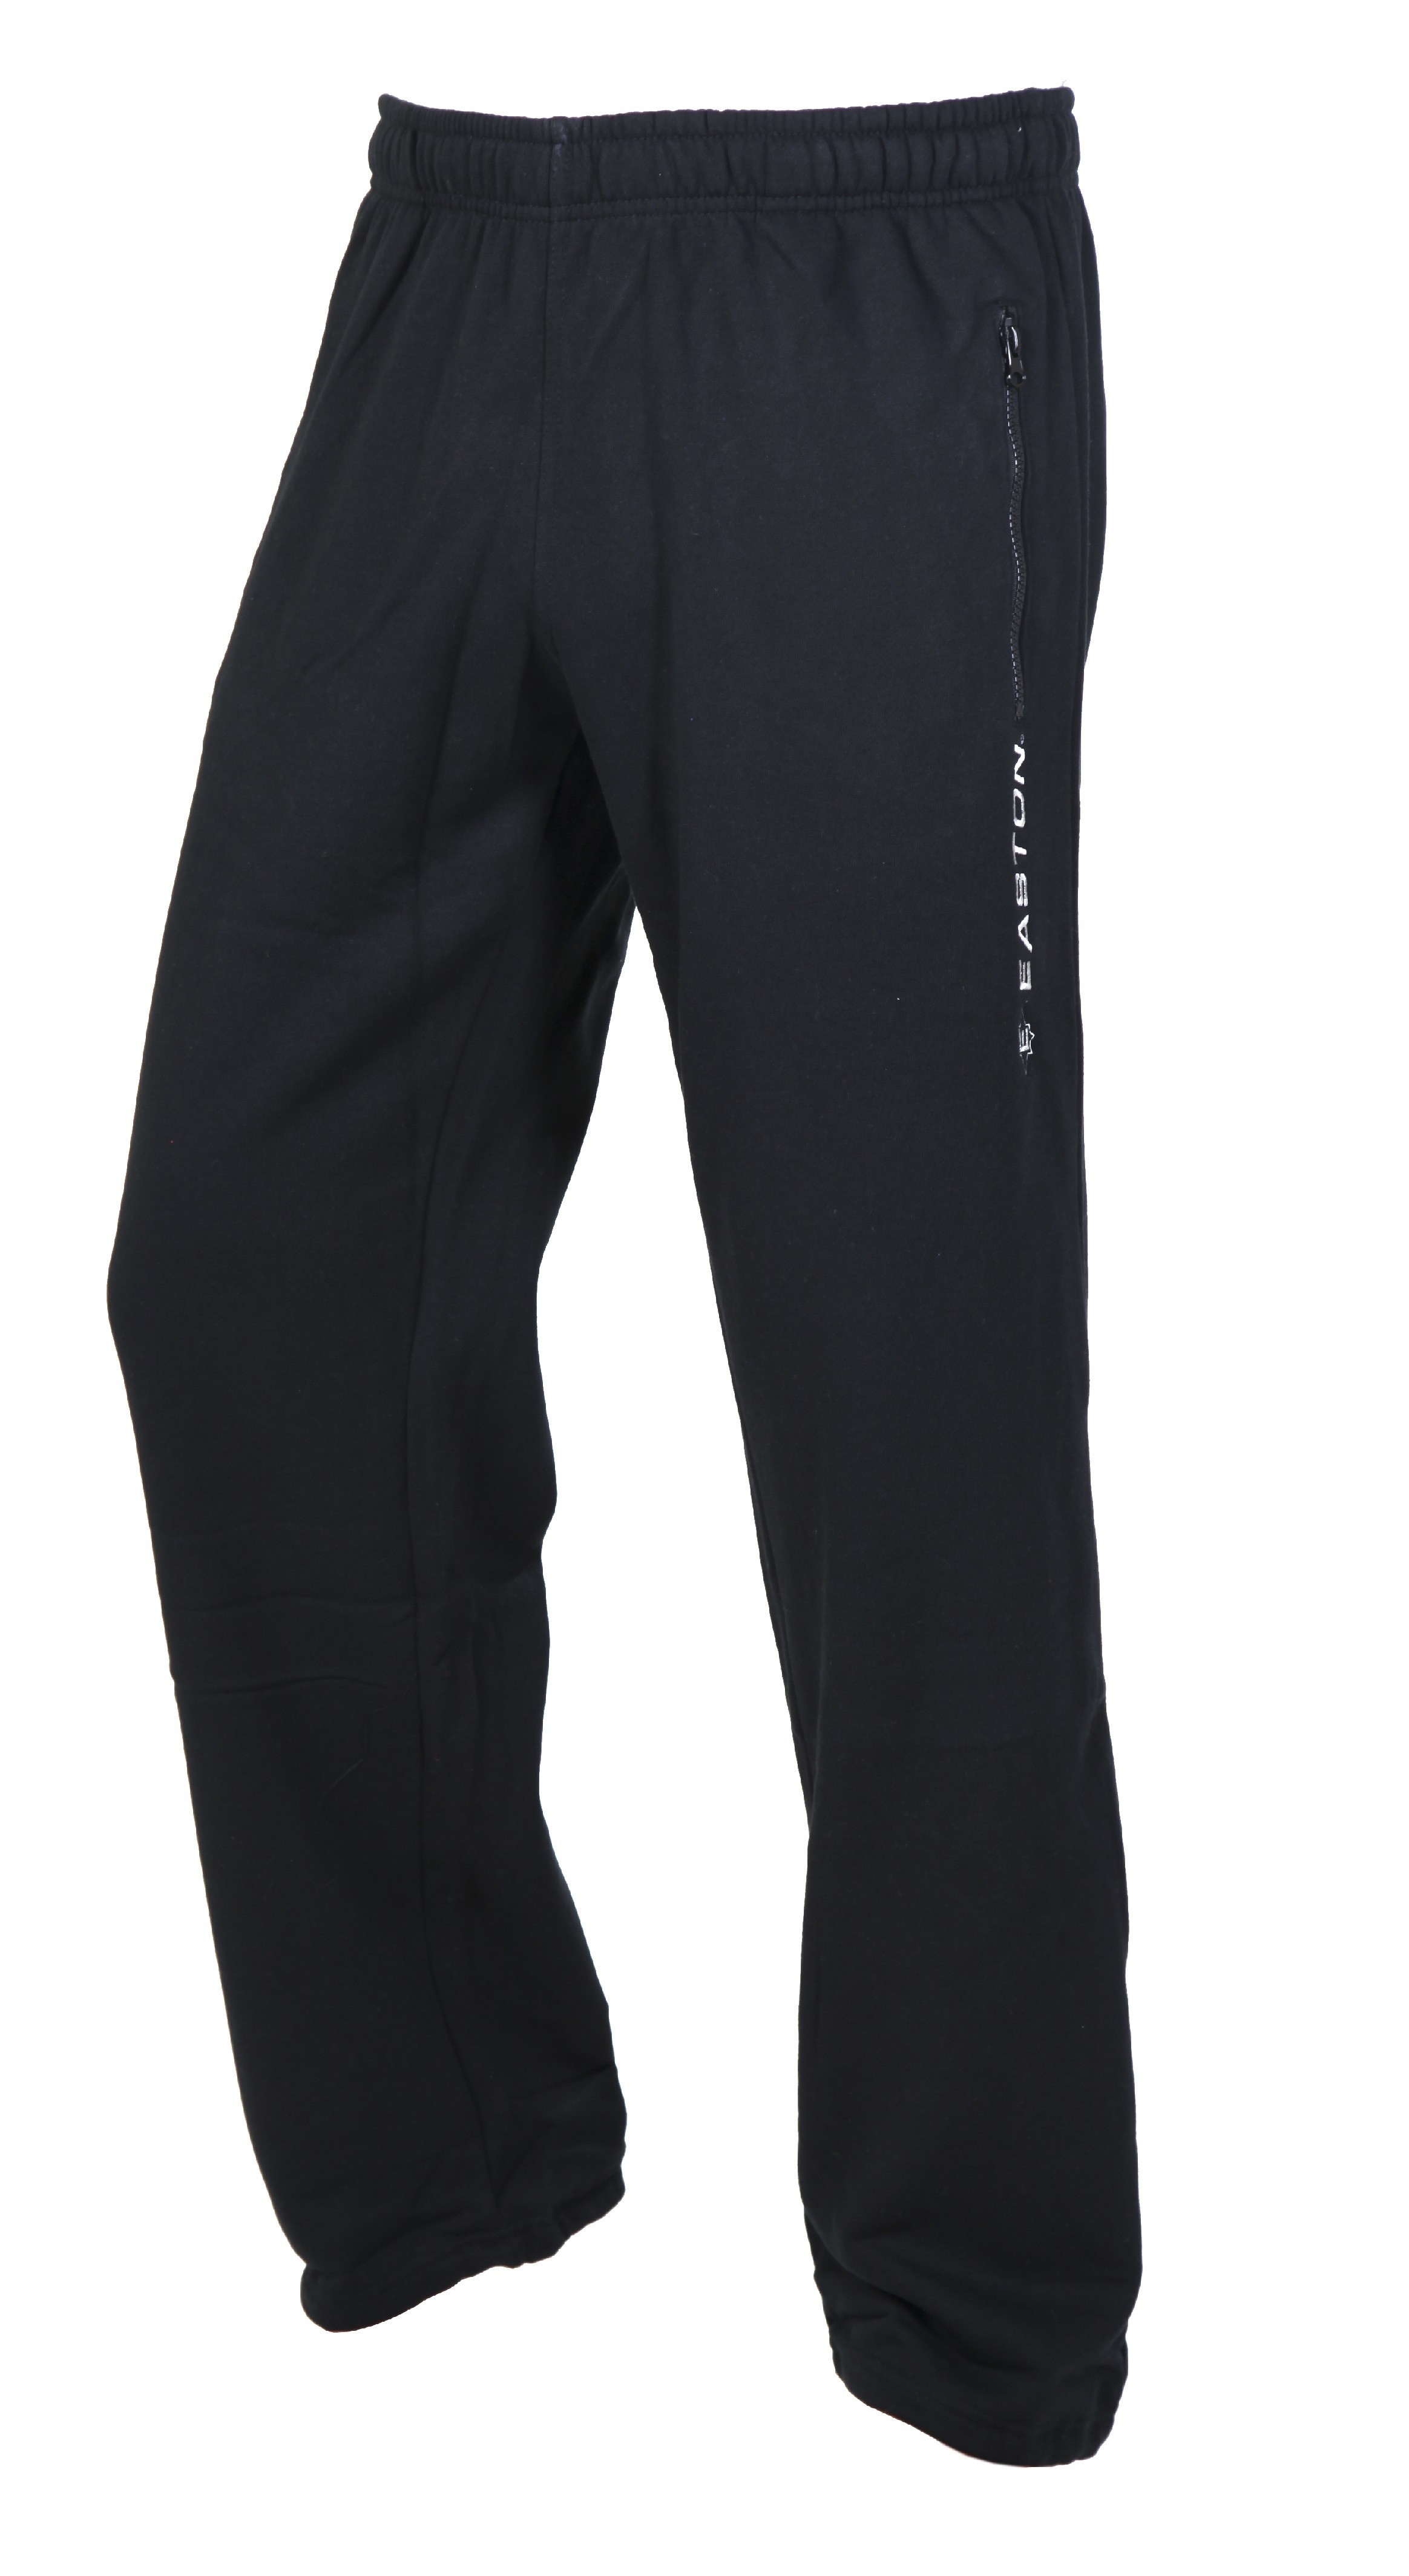 Easton Junior Warm Up Pants